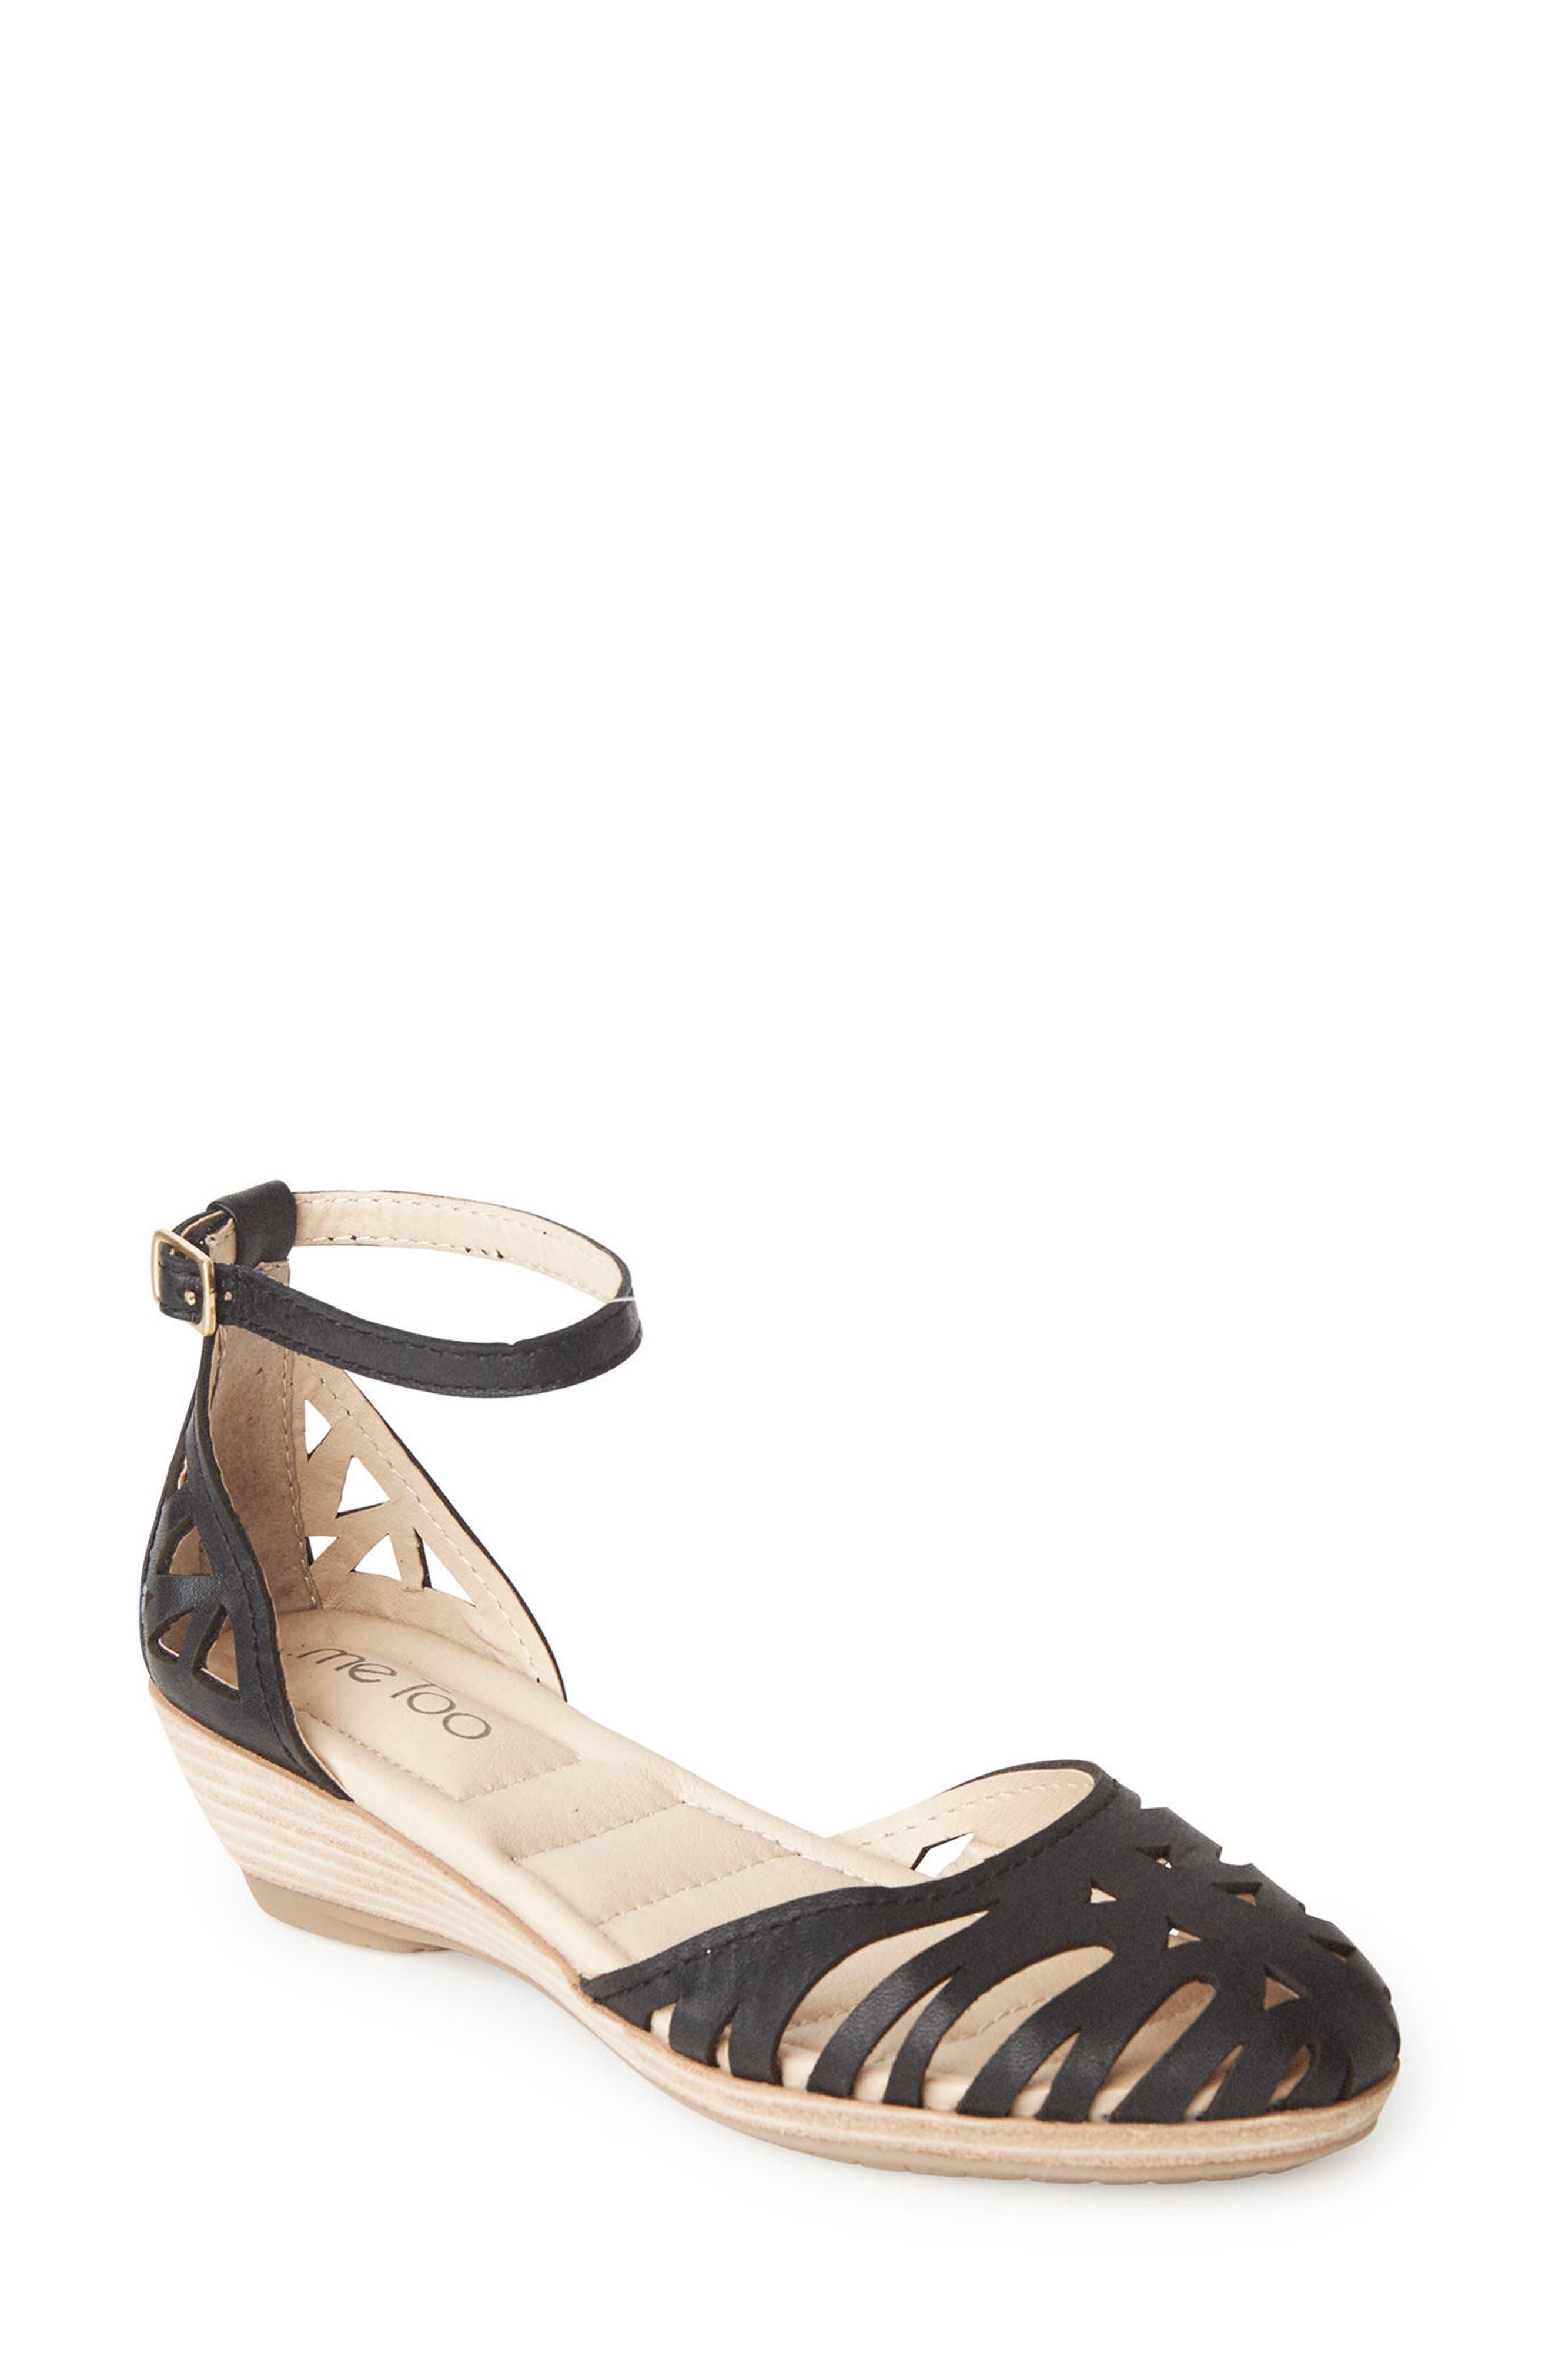 Nalani Ankle Strap Sandal,                         Main,                         color, 010